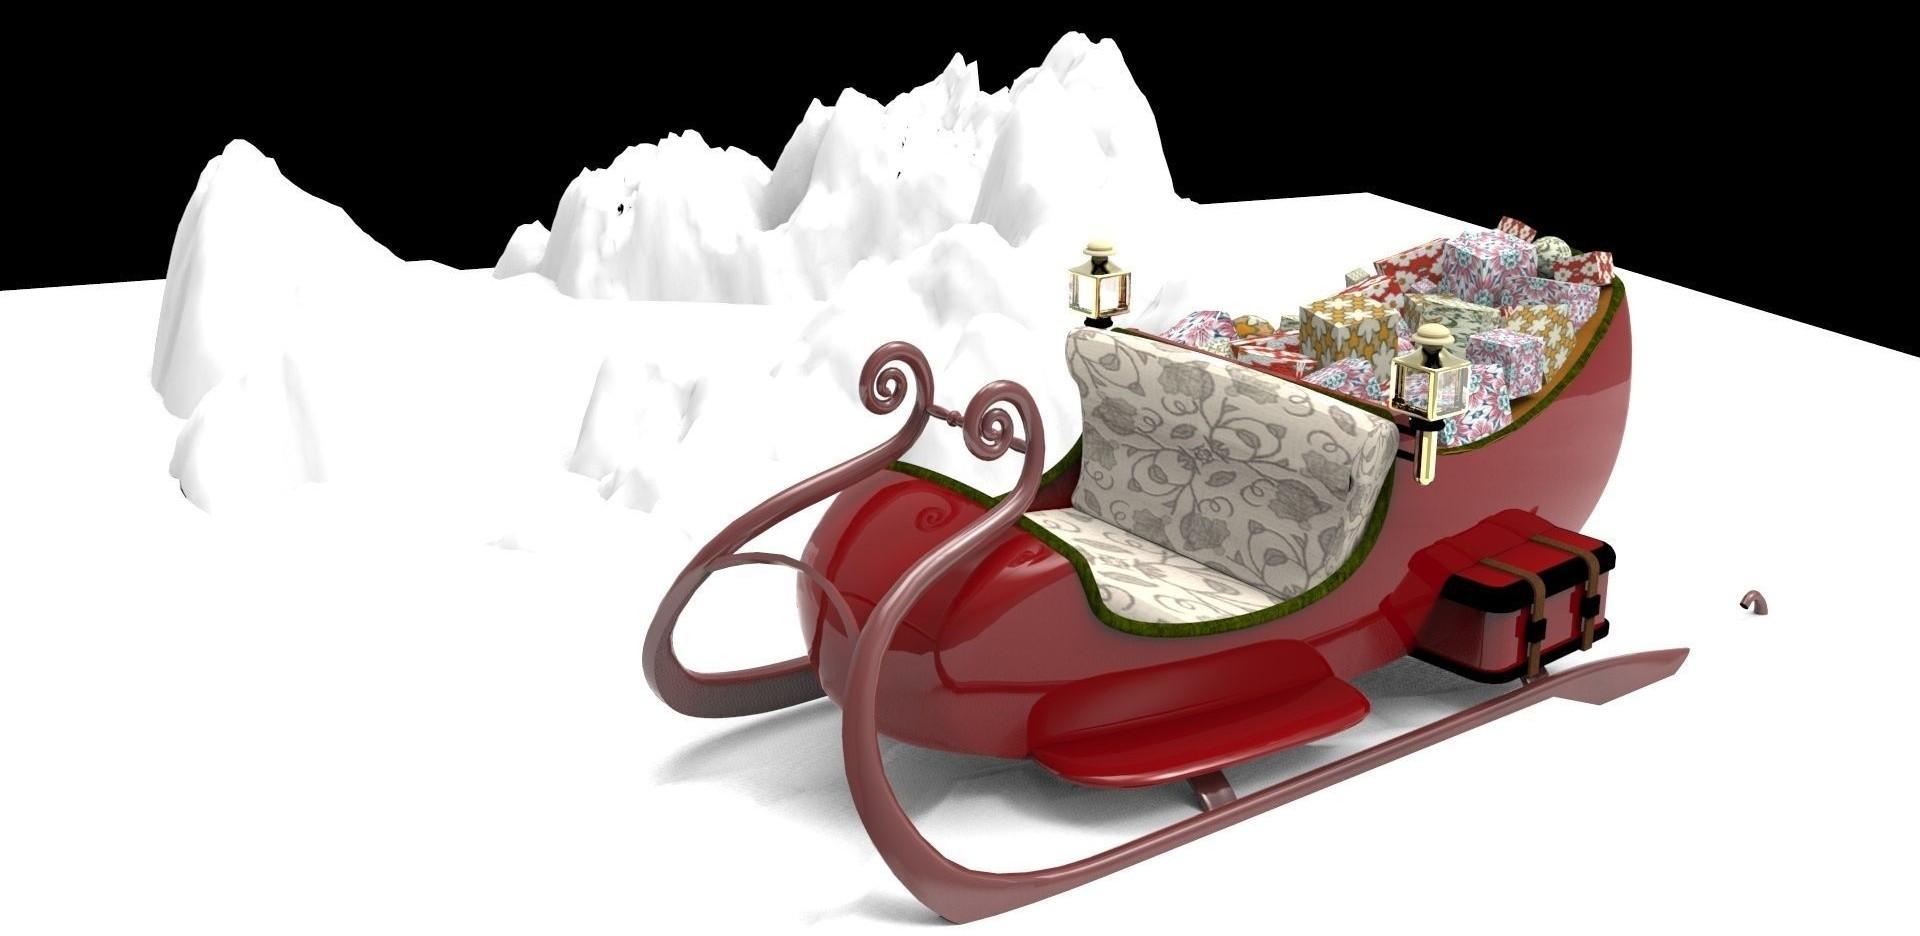 santa_sleigh_3d_model_free